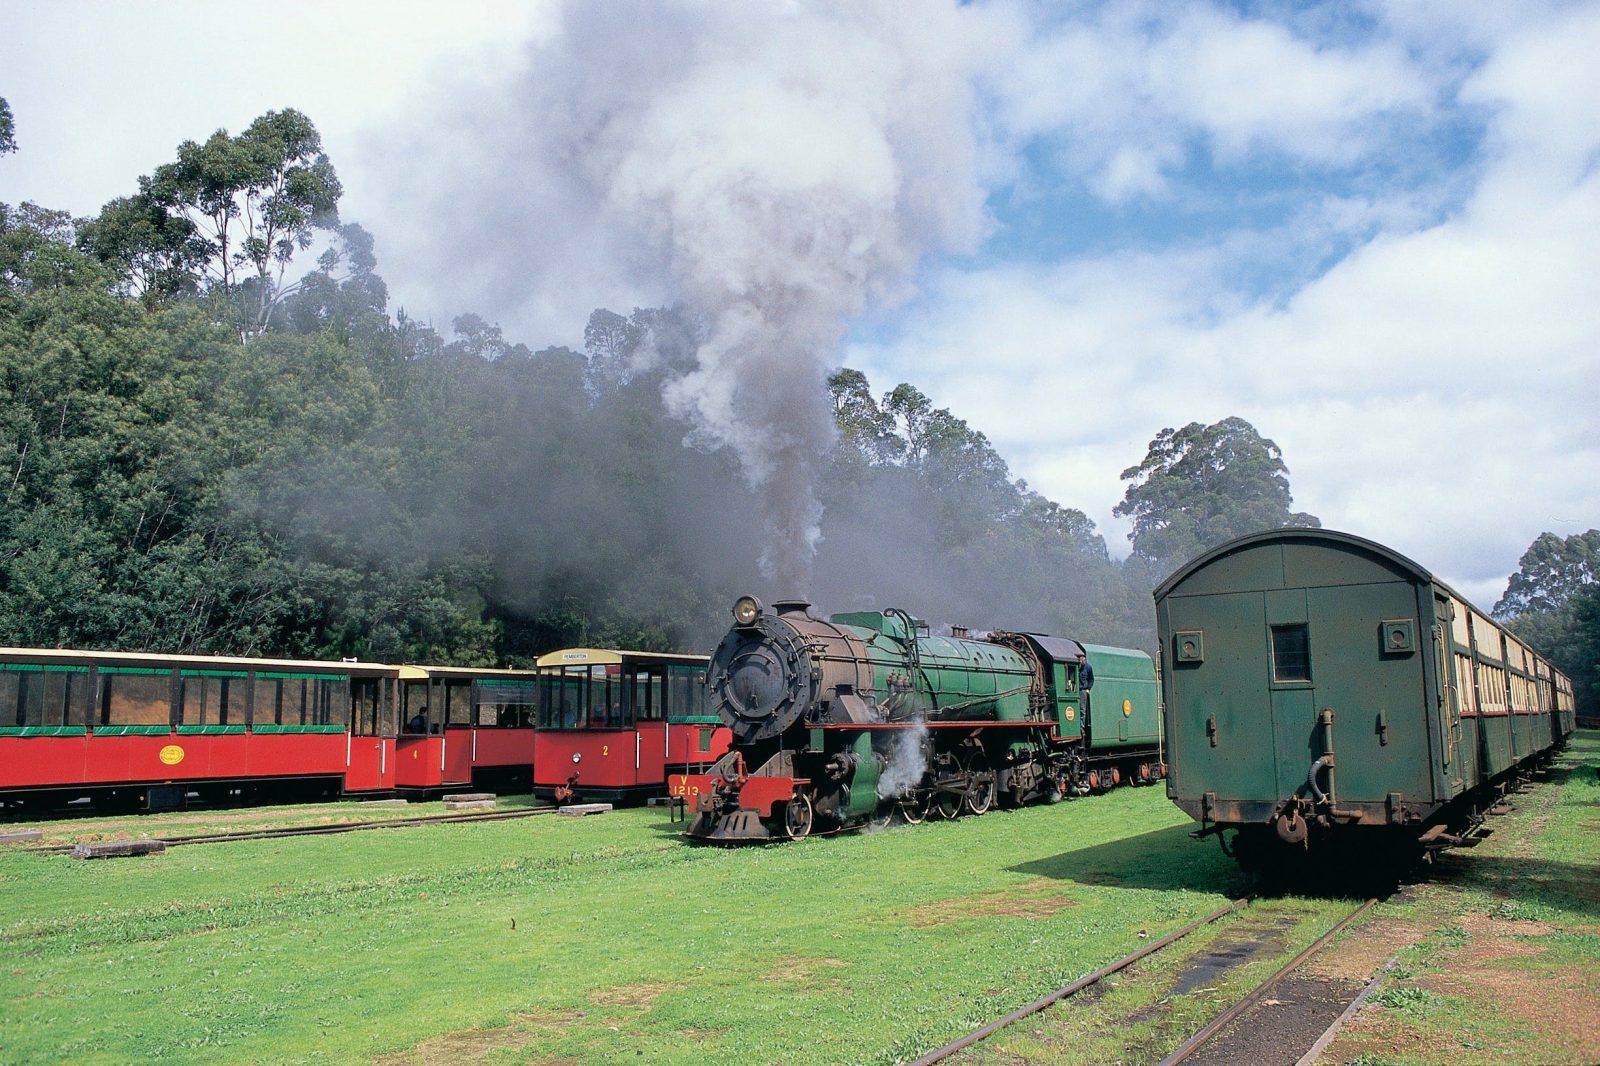 Pemberton Tramway Company, emberton, Western Australia